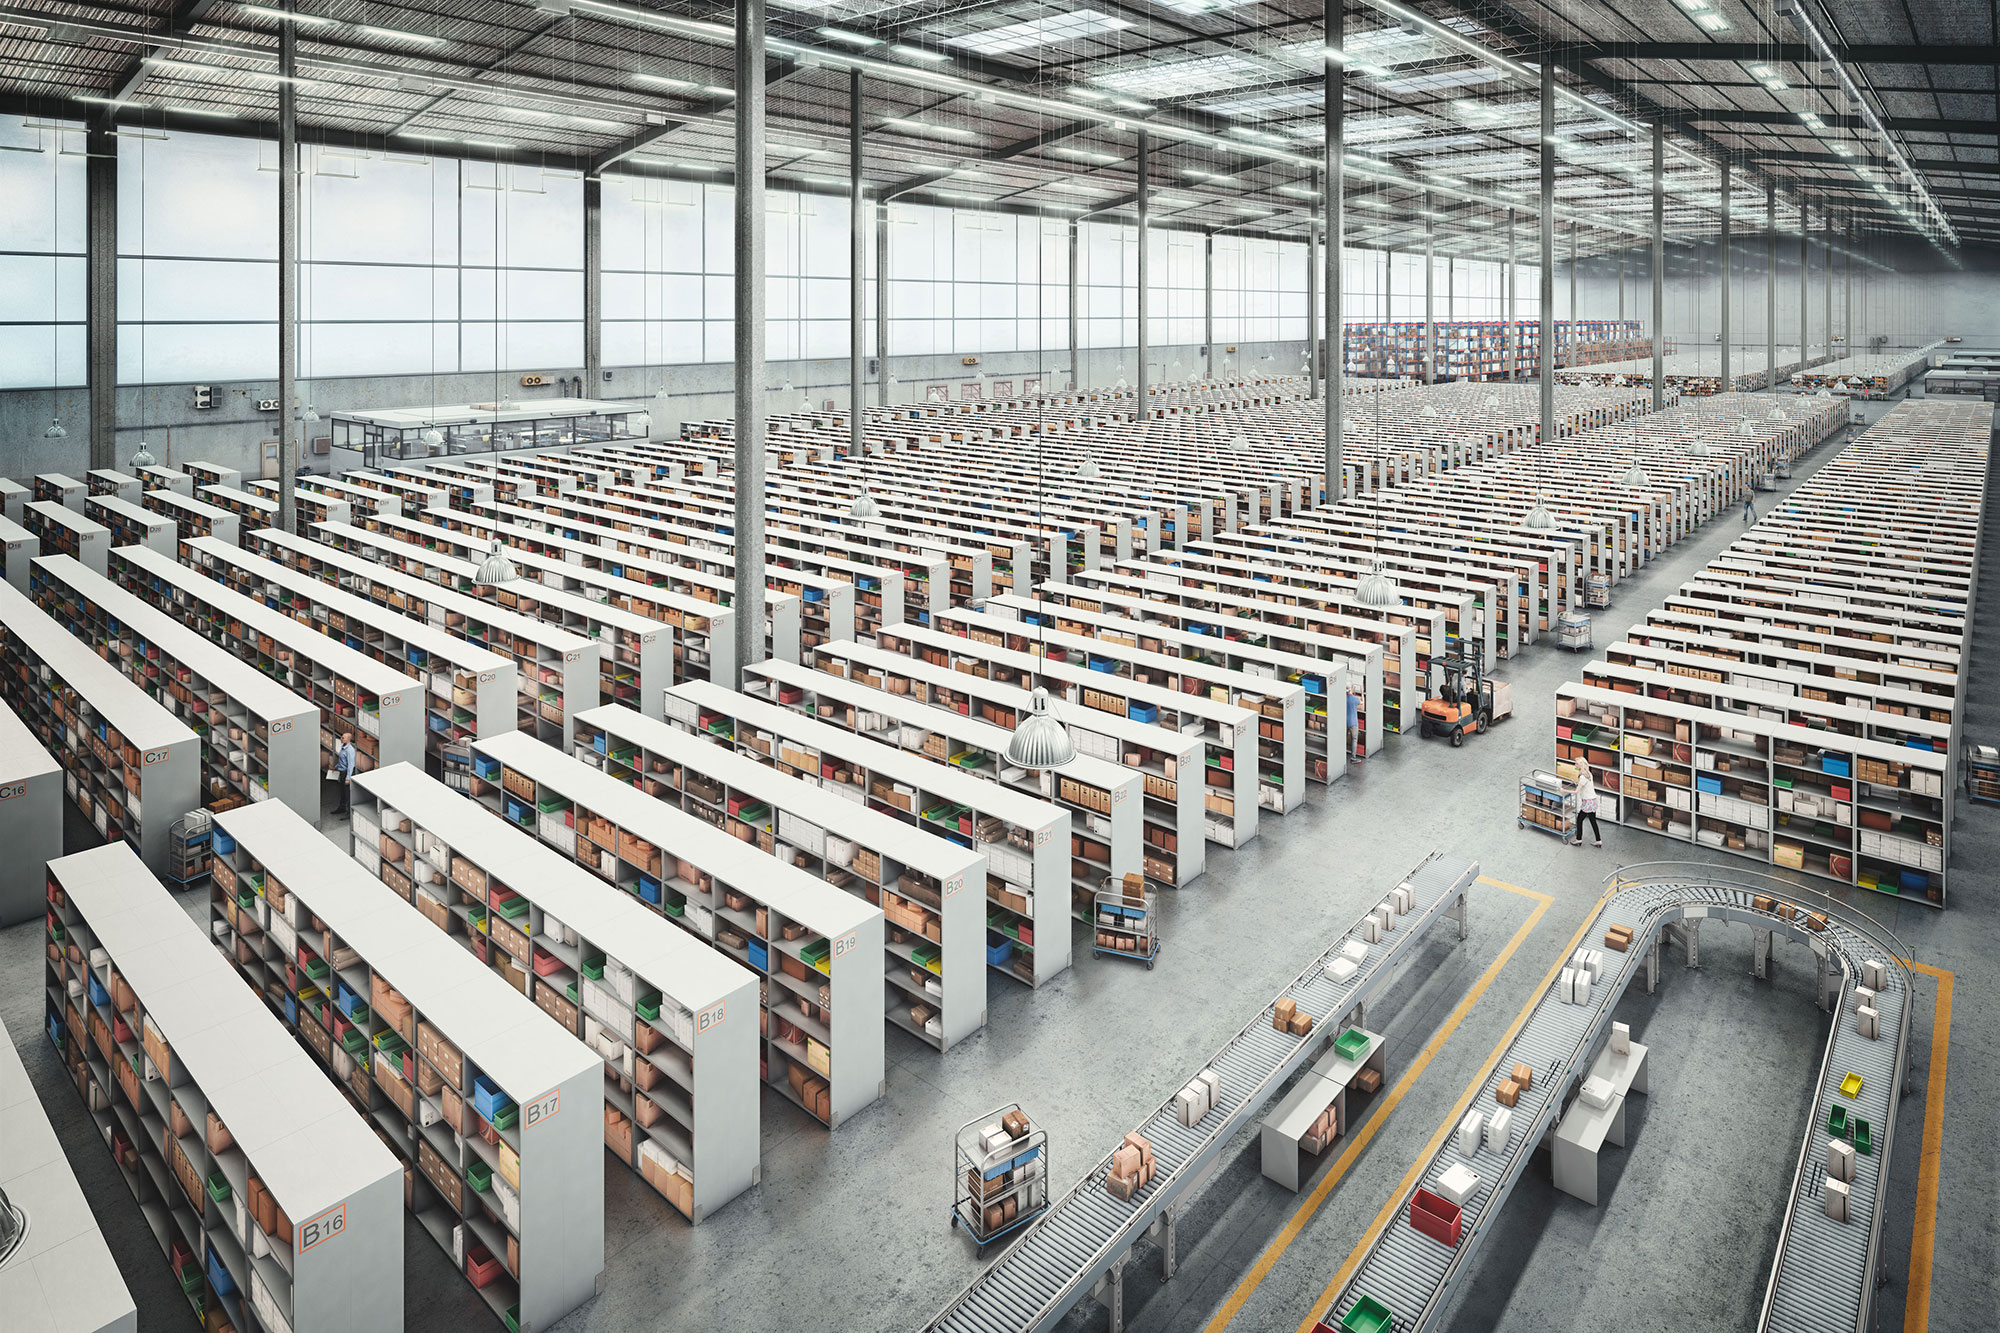 CGI Rendering 3d T-Systems Halle Lager Regale Versand Interior Idris Kolodziej